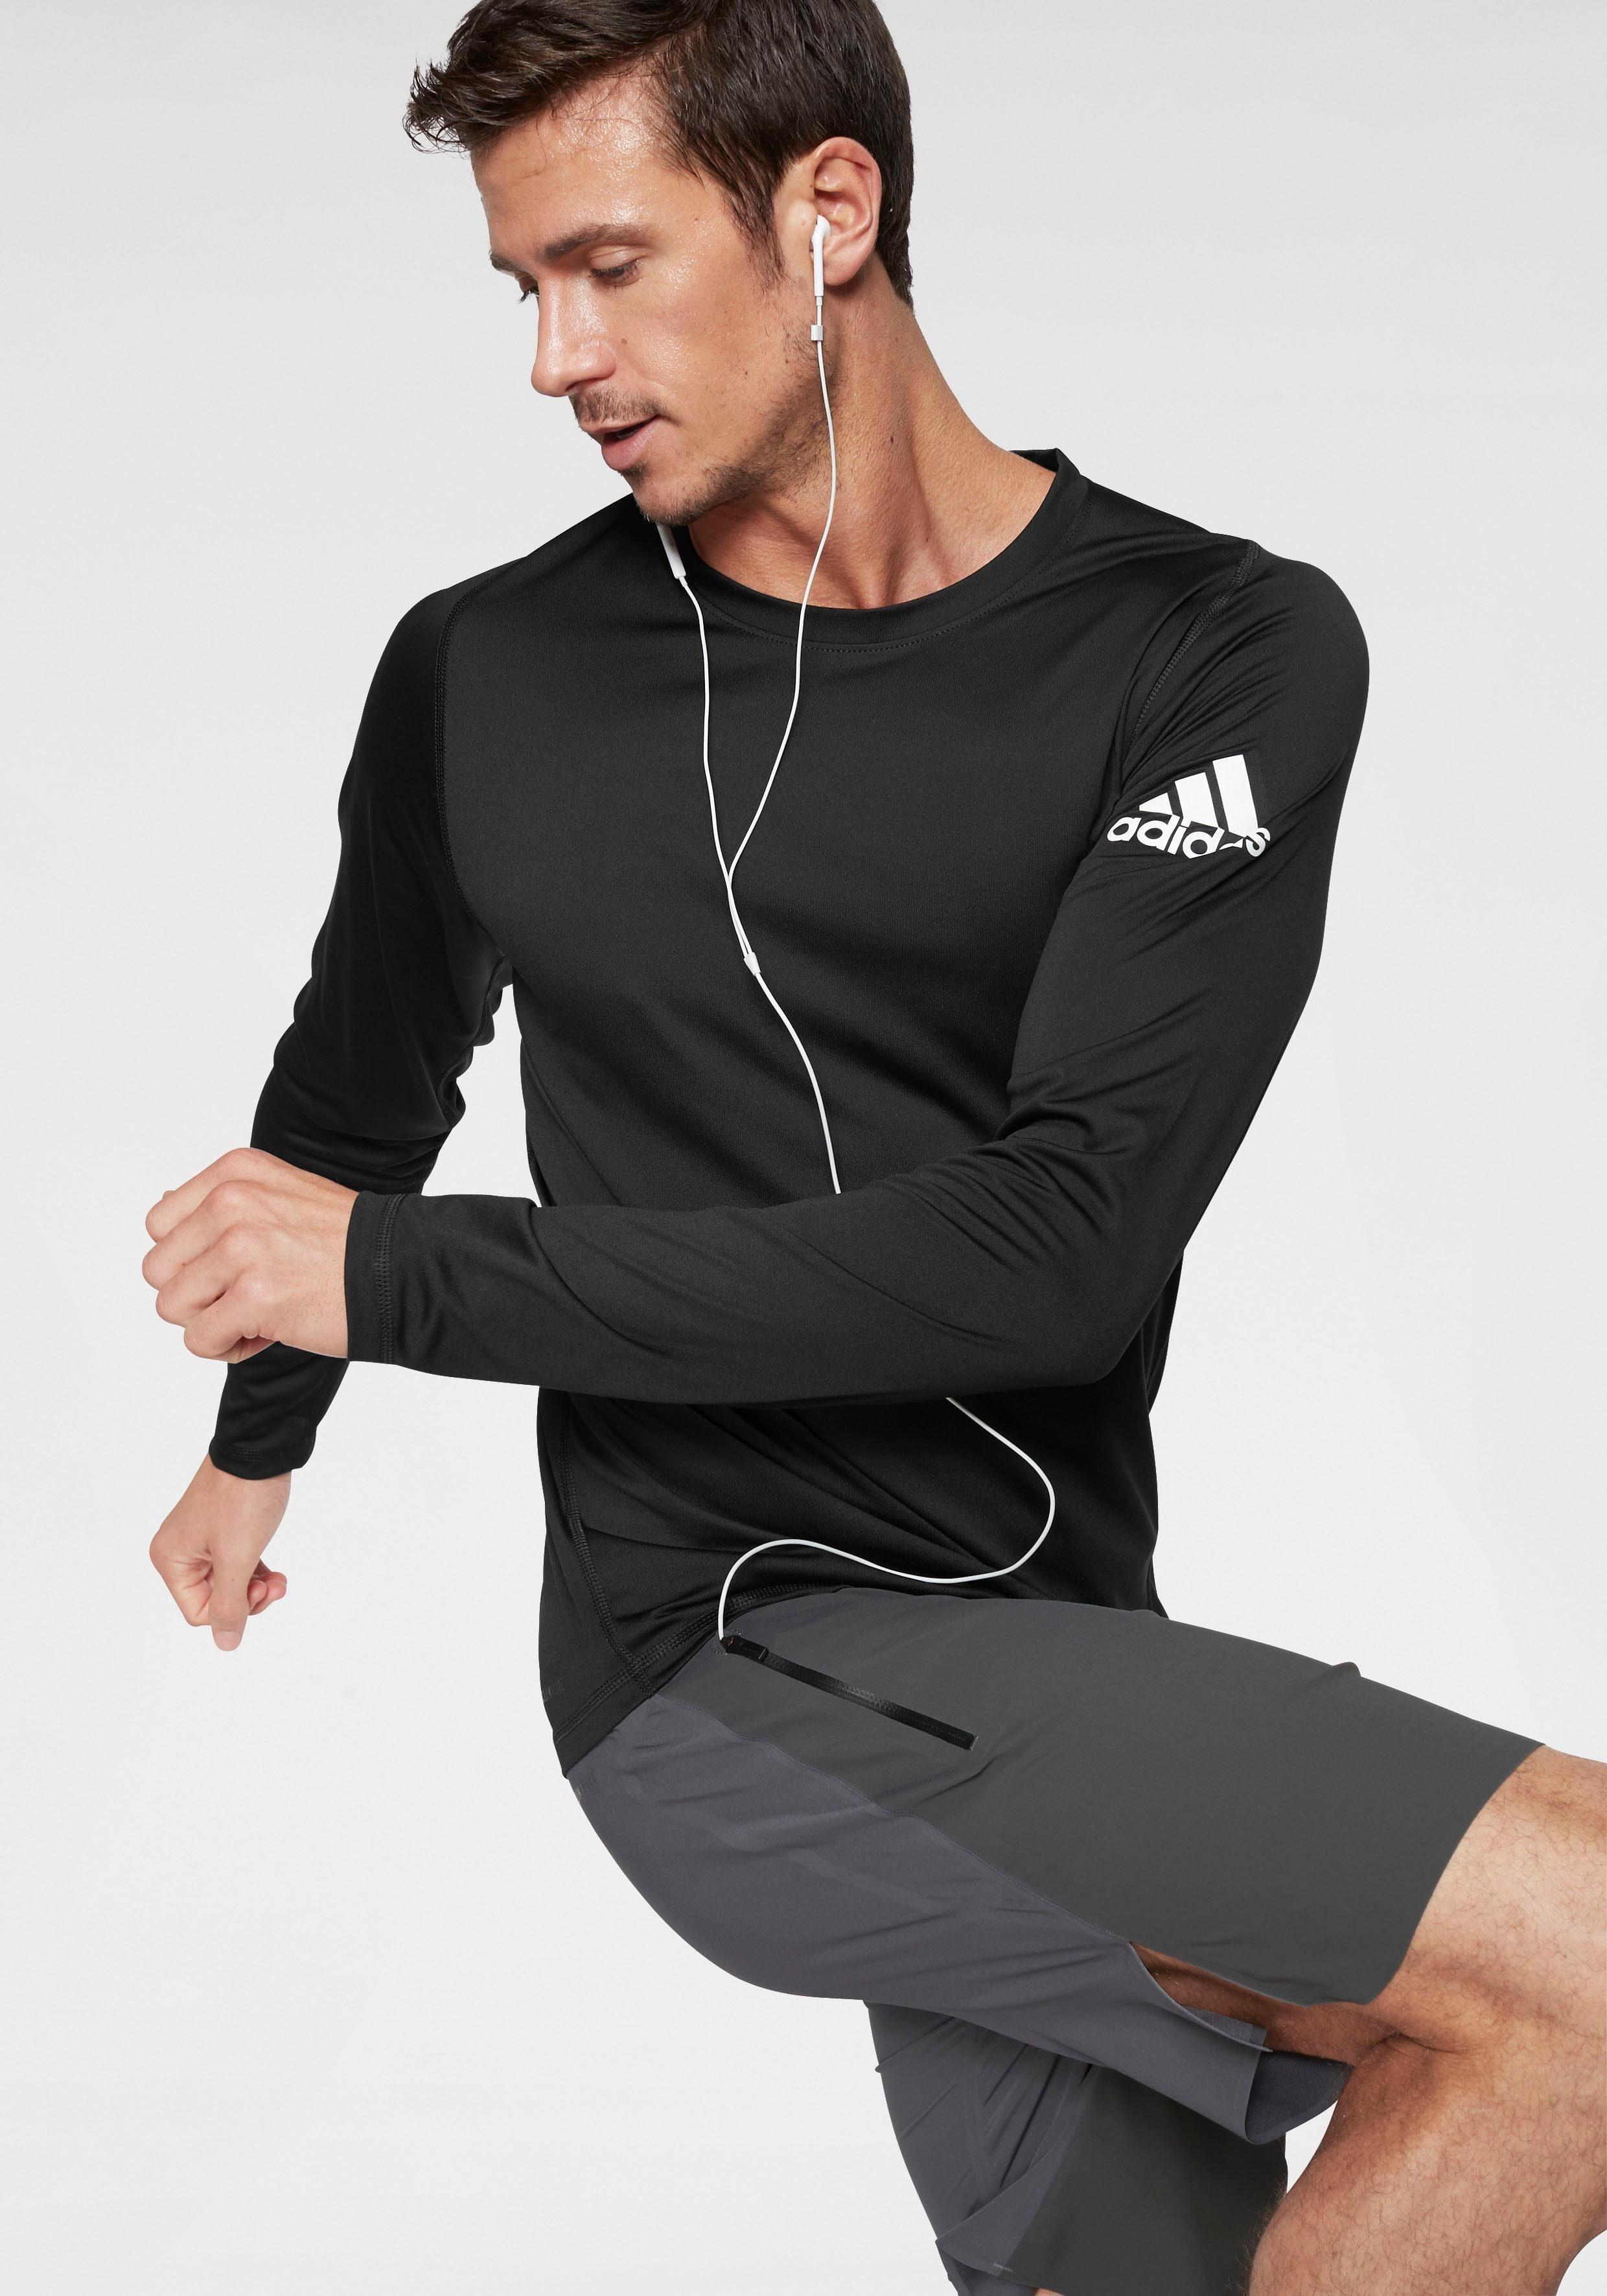 adidas Performance Funktionsshirt »FL_SPORT LEVEL X BOS LONGSLEEVE« online kaufen | OTTO